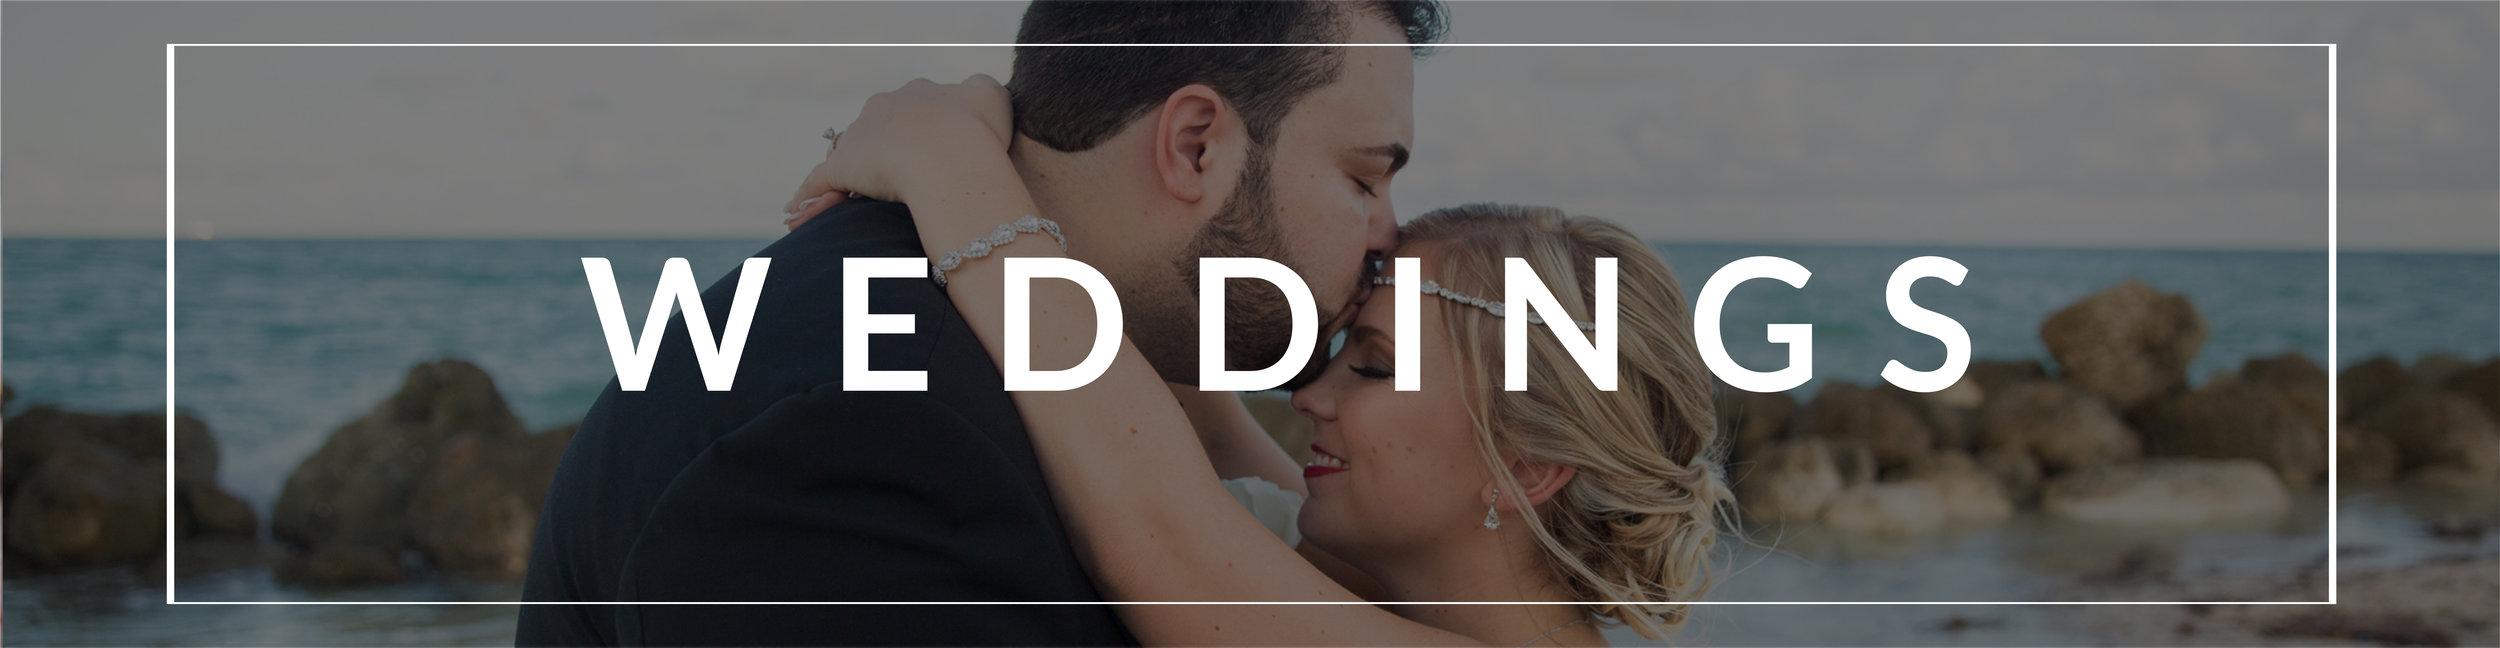 2018_Weddings_Headline(noborder)-1.jpg